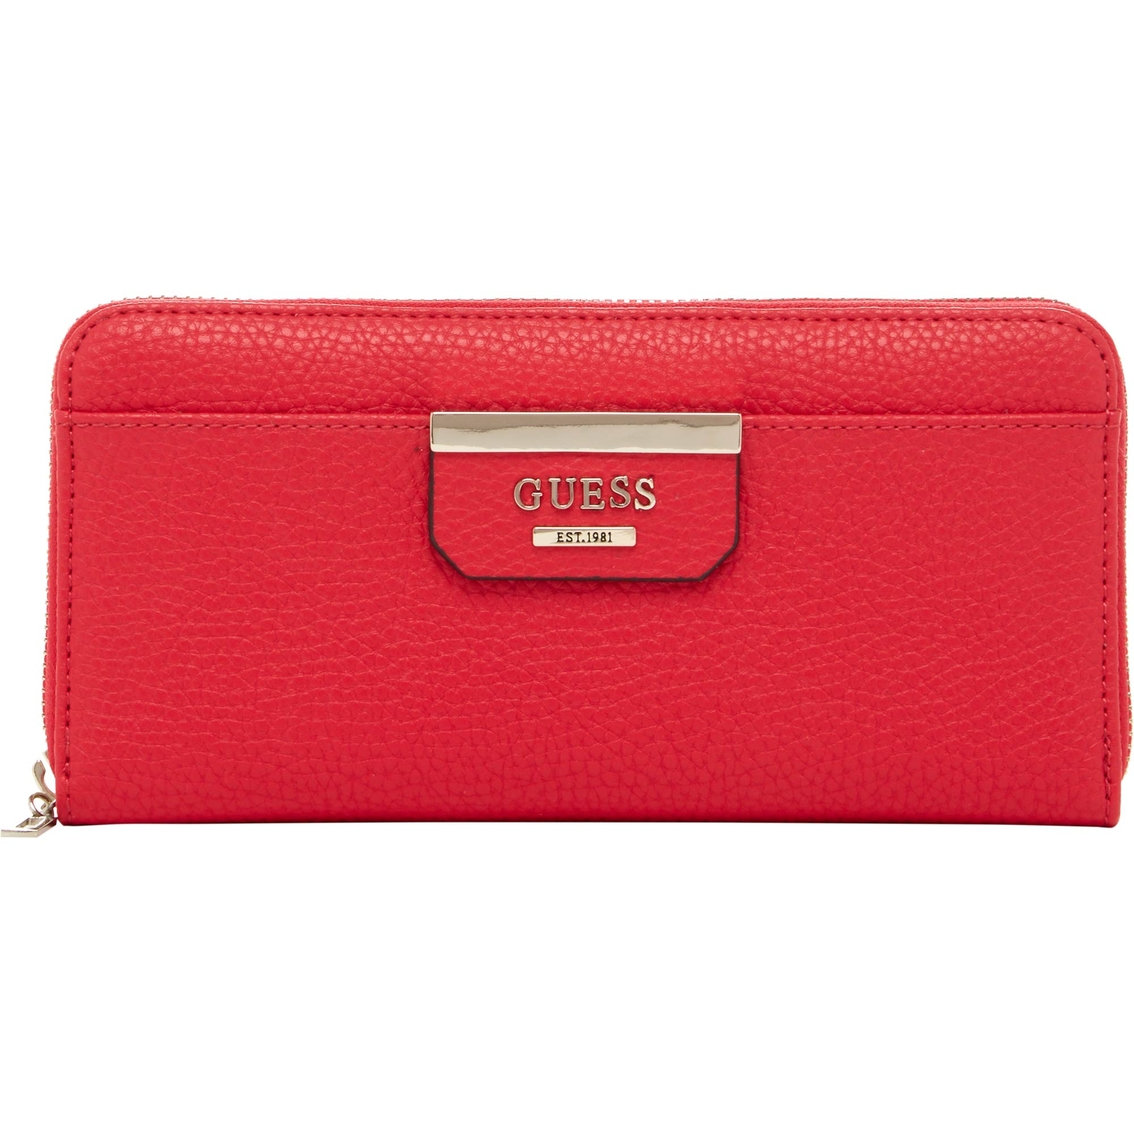 rigenerativa montare Legare  Guess Bobbi Zip Around Wallet   Wallets   Clothing & Accessories   Shop The  Exchange